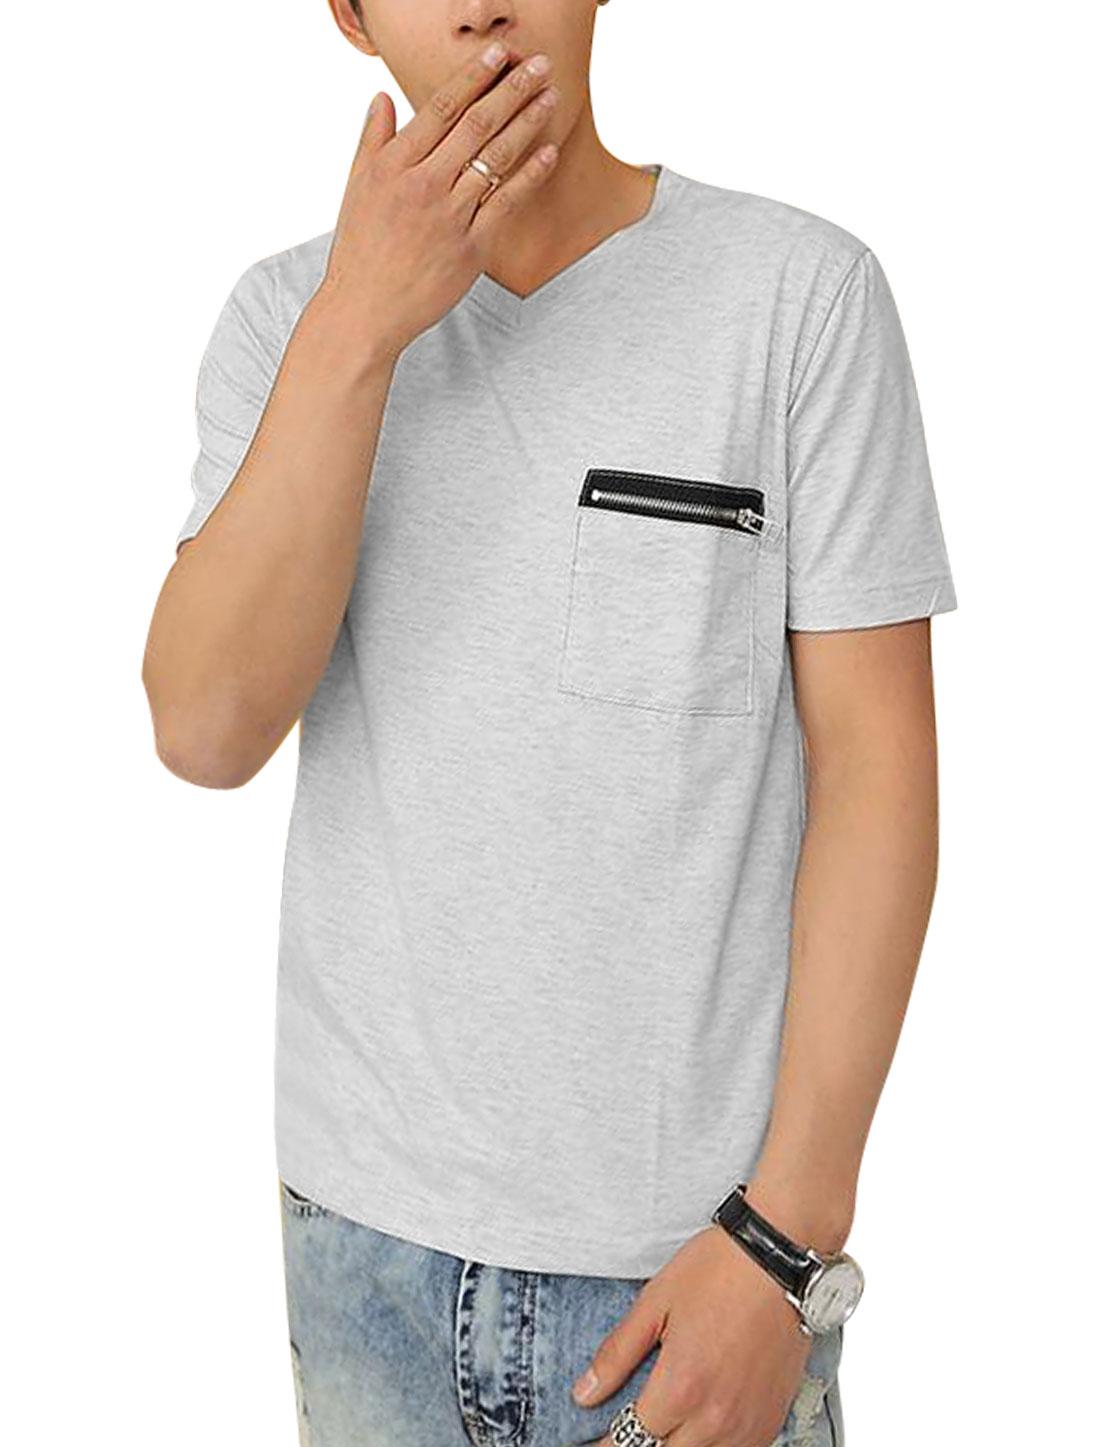 Men Short Sleeve Zip Up Chest Pocket Personalized Tee Shirt Light Gray S